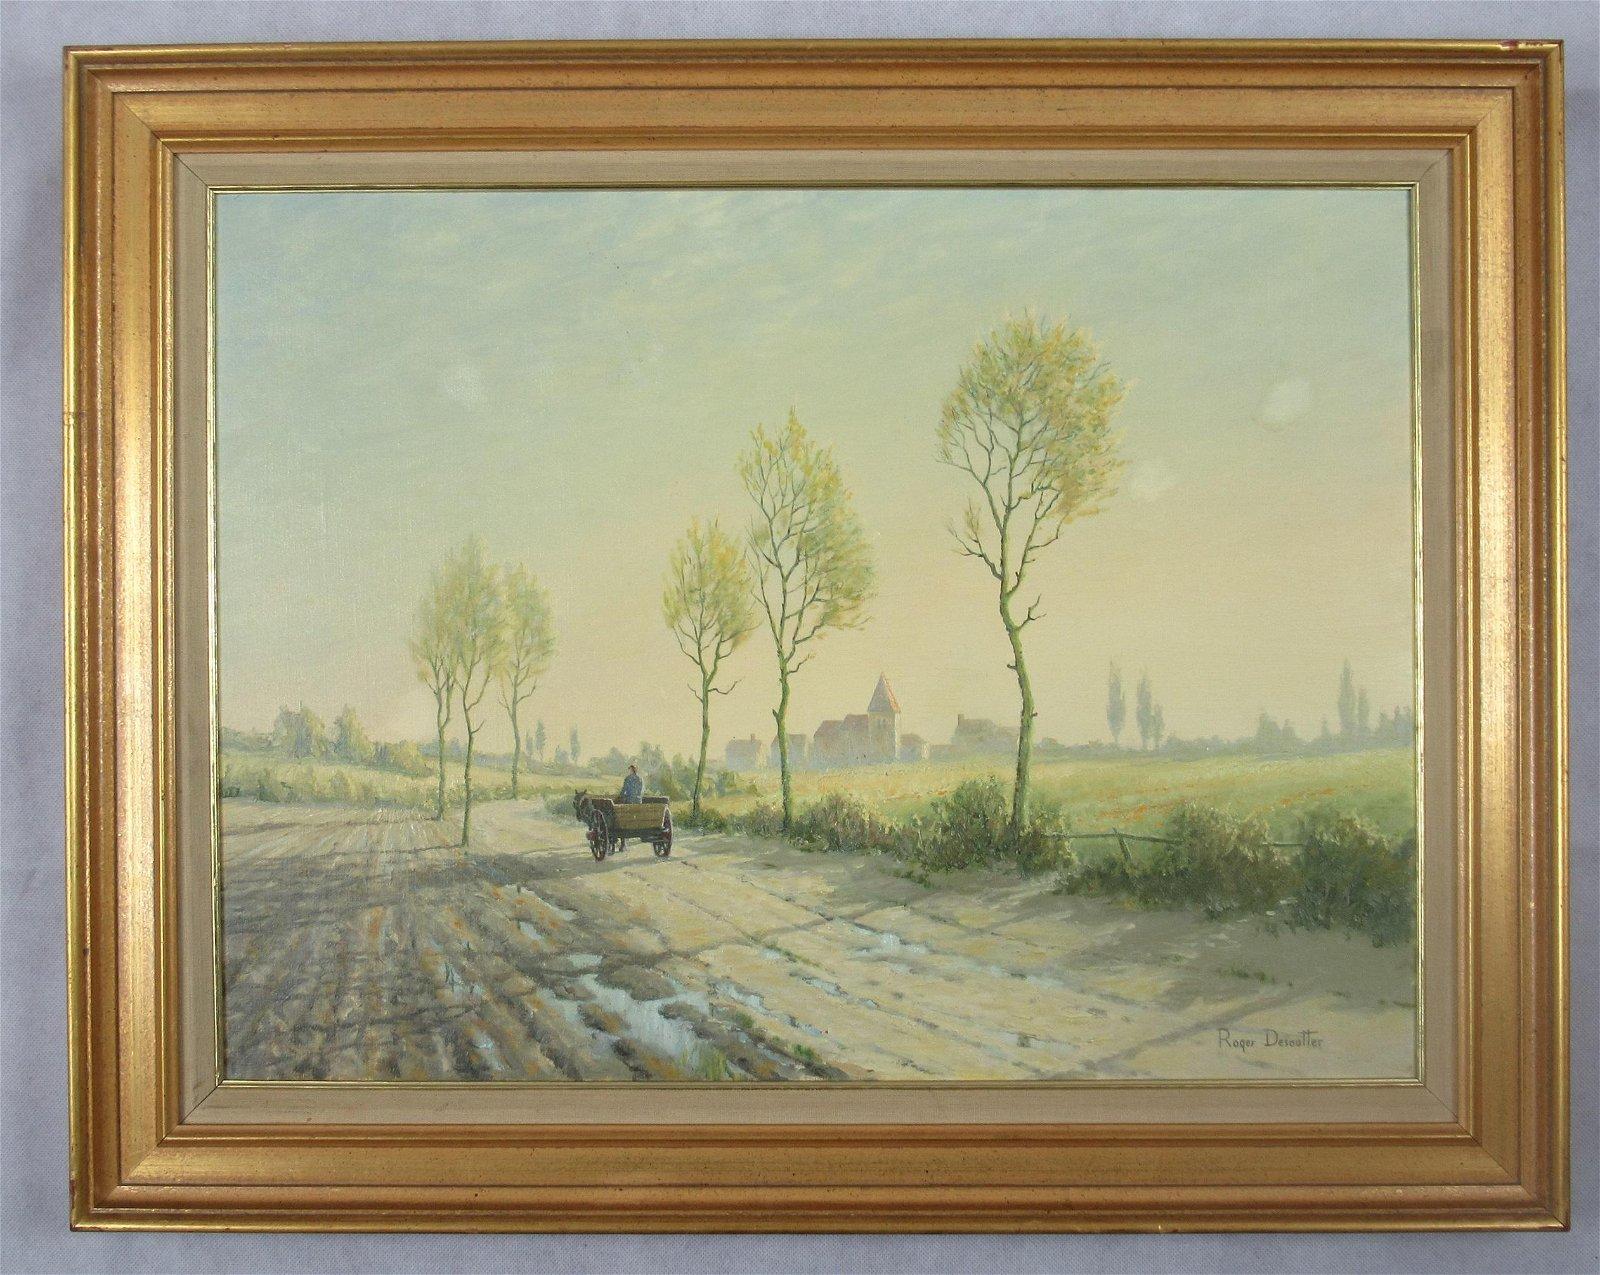 Roger Desoutter oil painting